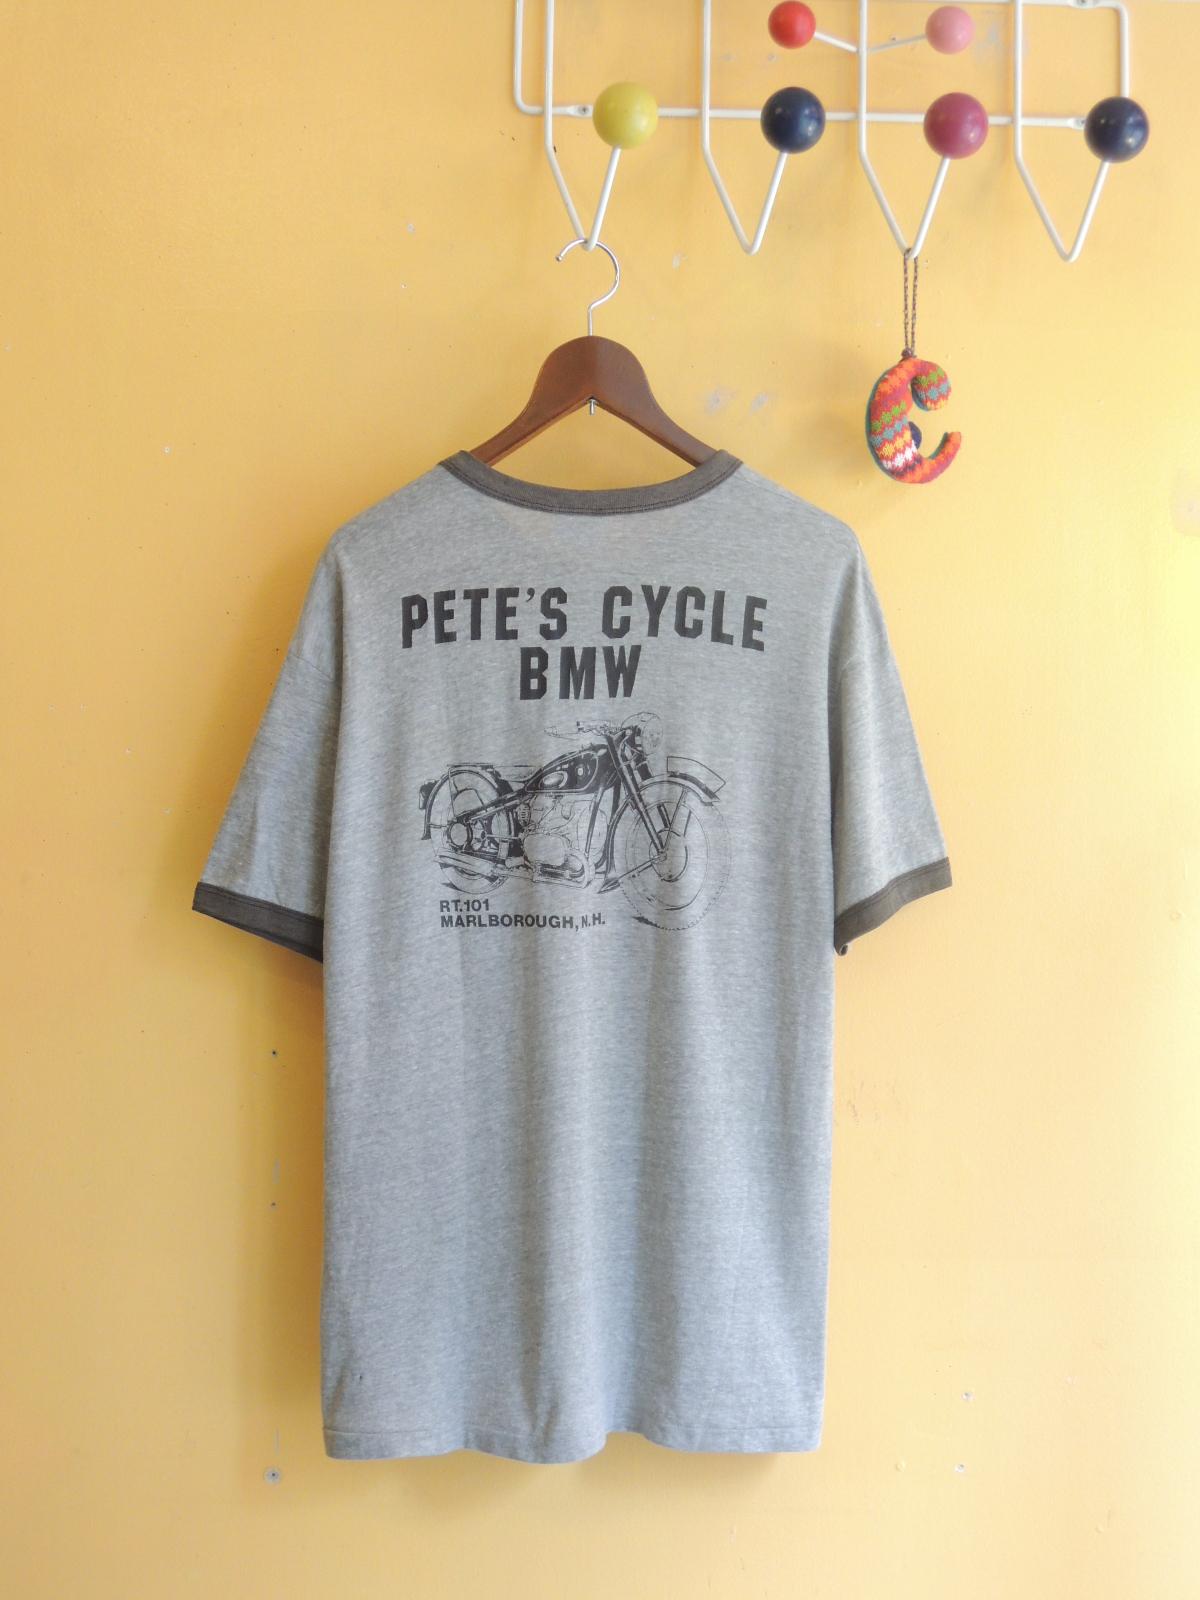 peterscyclebmwtshirts04.JPG